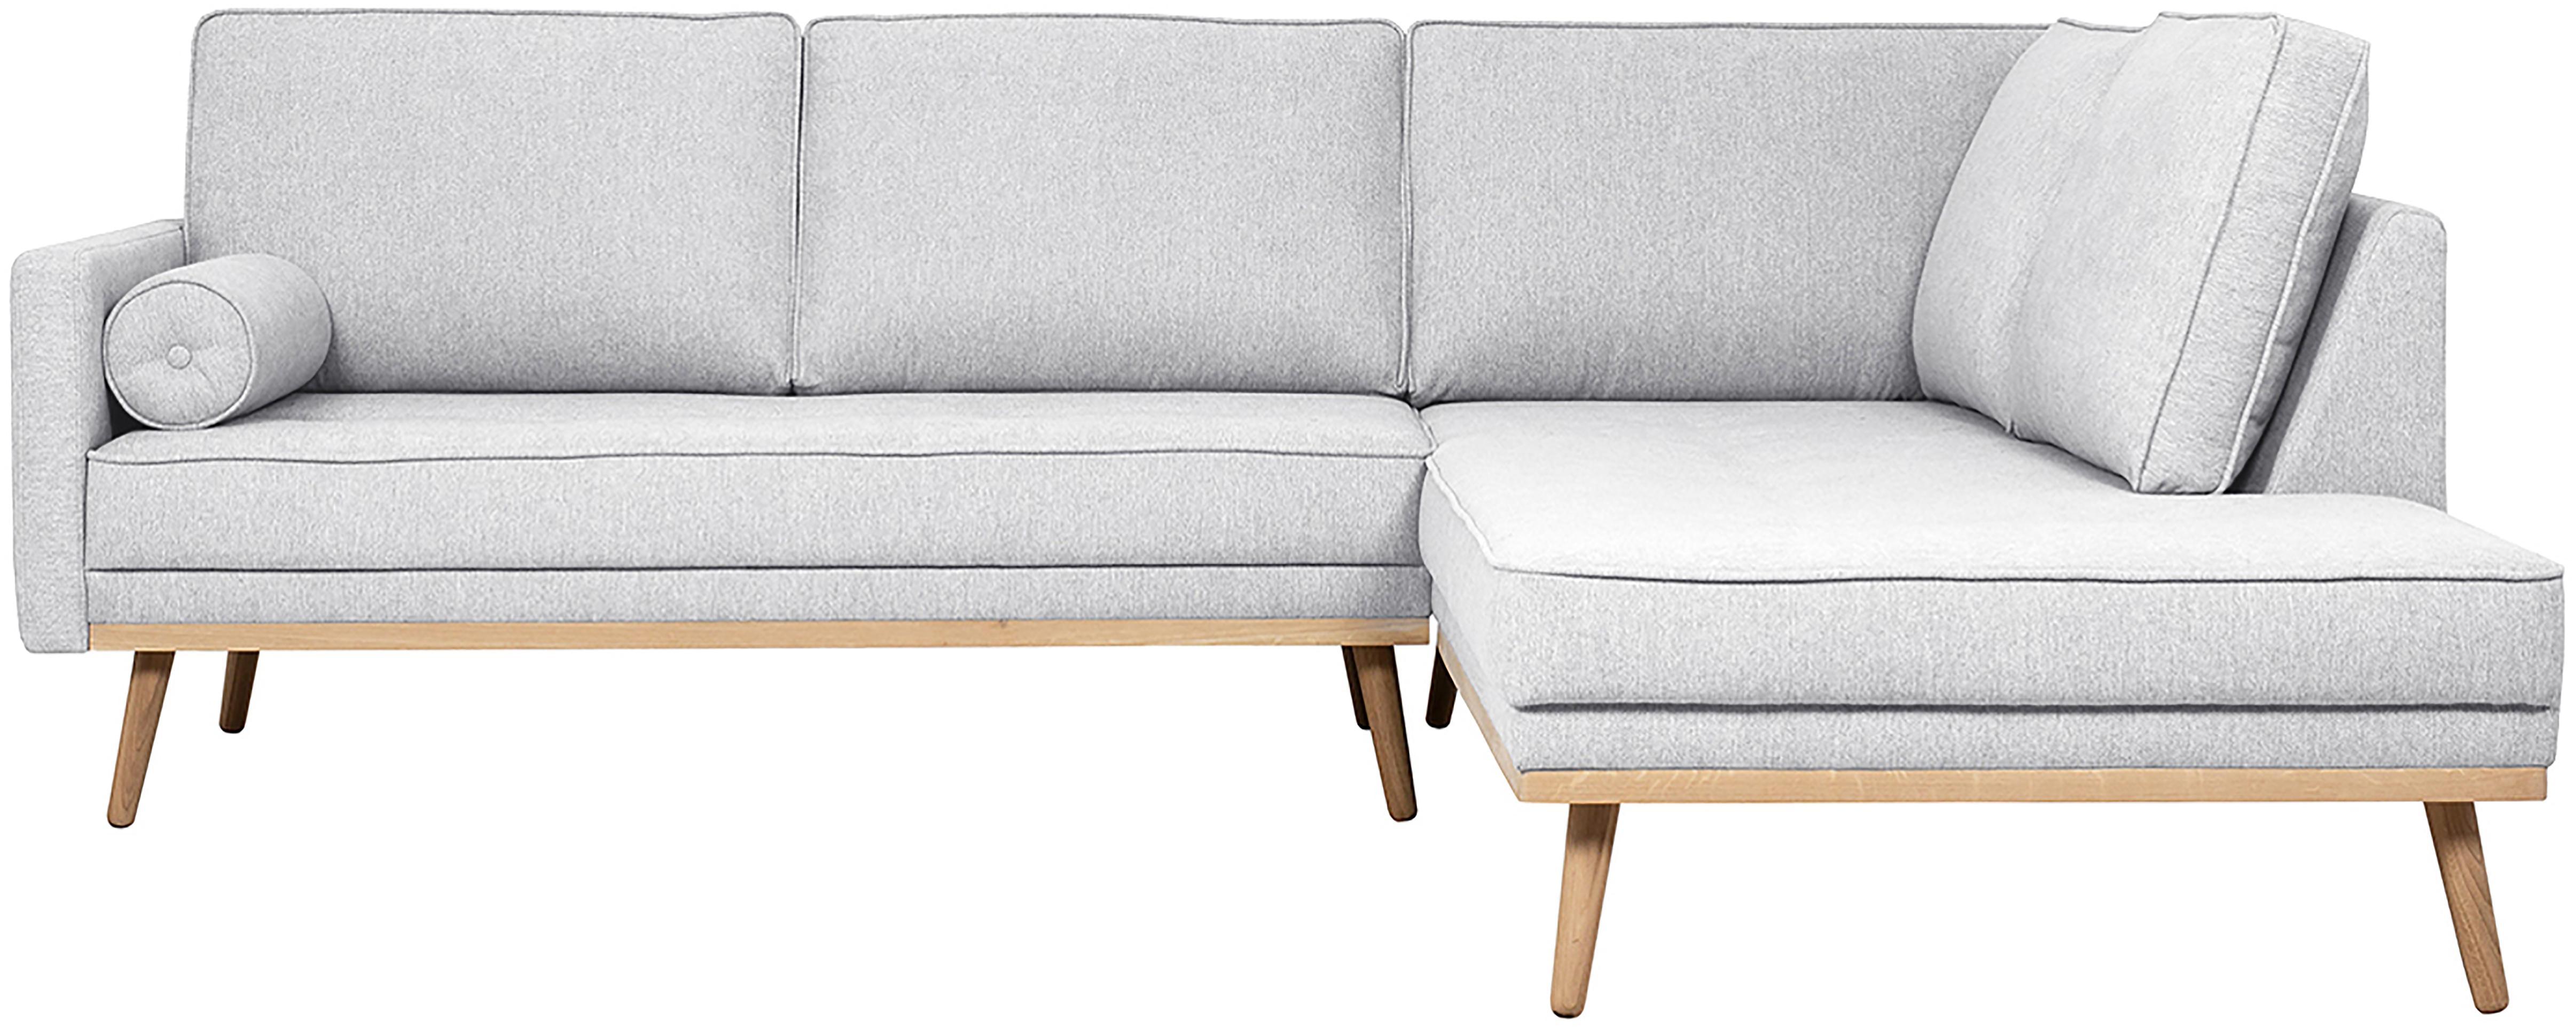 Ecksofa Saint (3-Sitzer), Bezug: Polyester 50.000 Scheuert, Gestell: Massives Kiefernholz, Spa, Webstoff Hellgrau, 243 x 70 cm